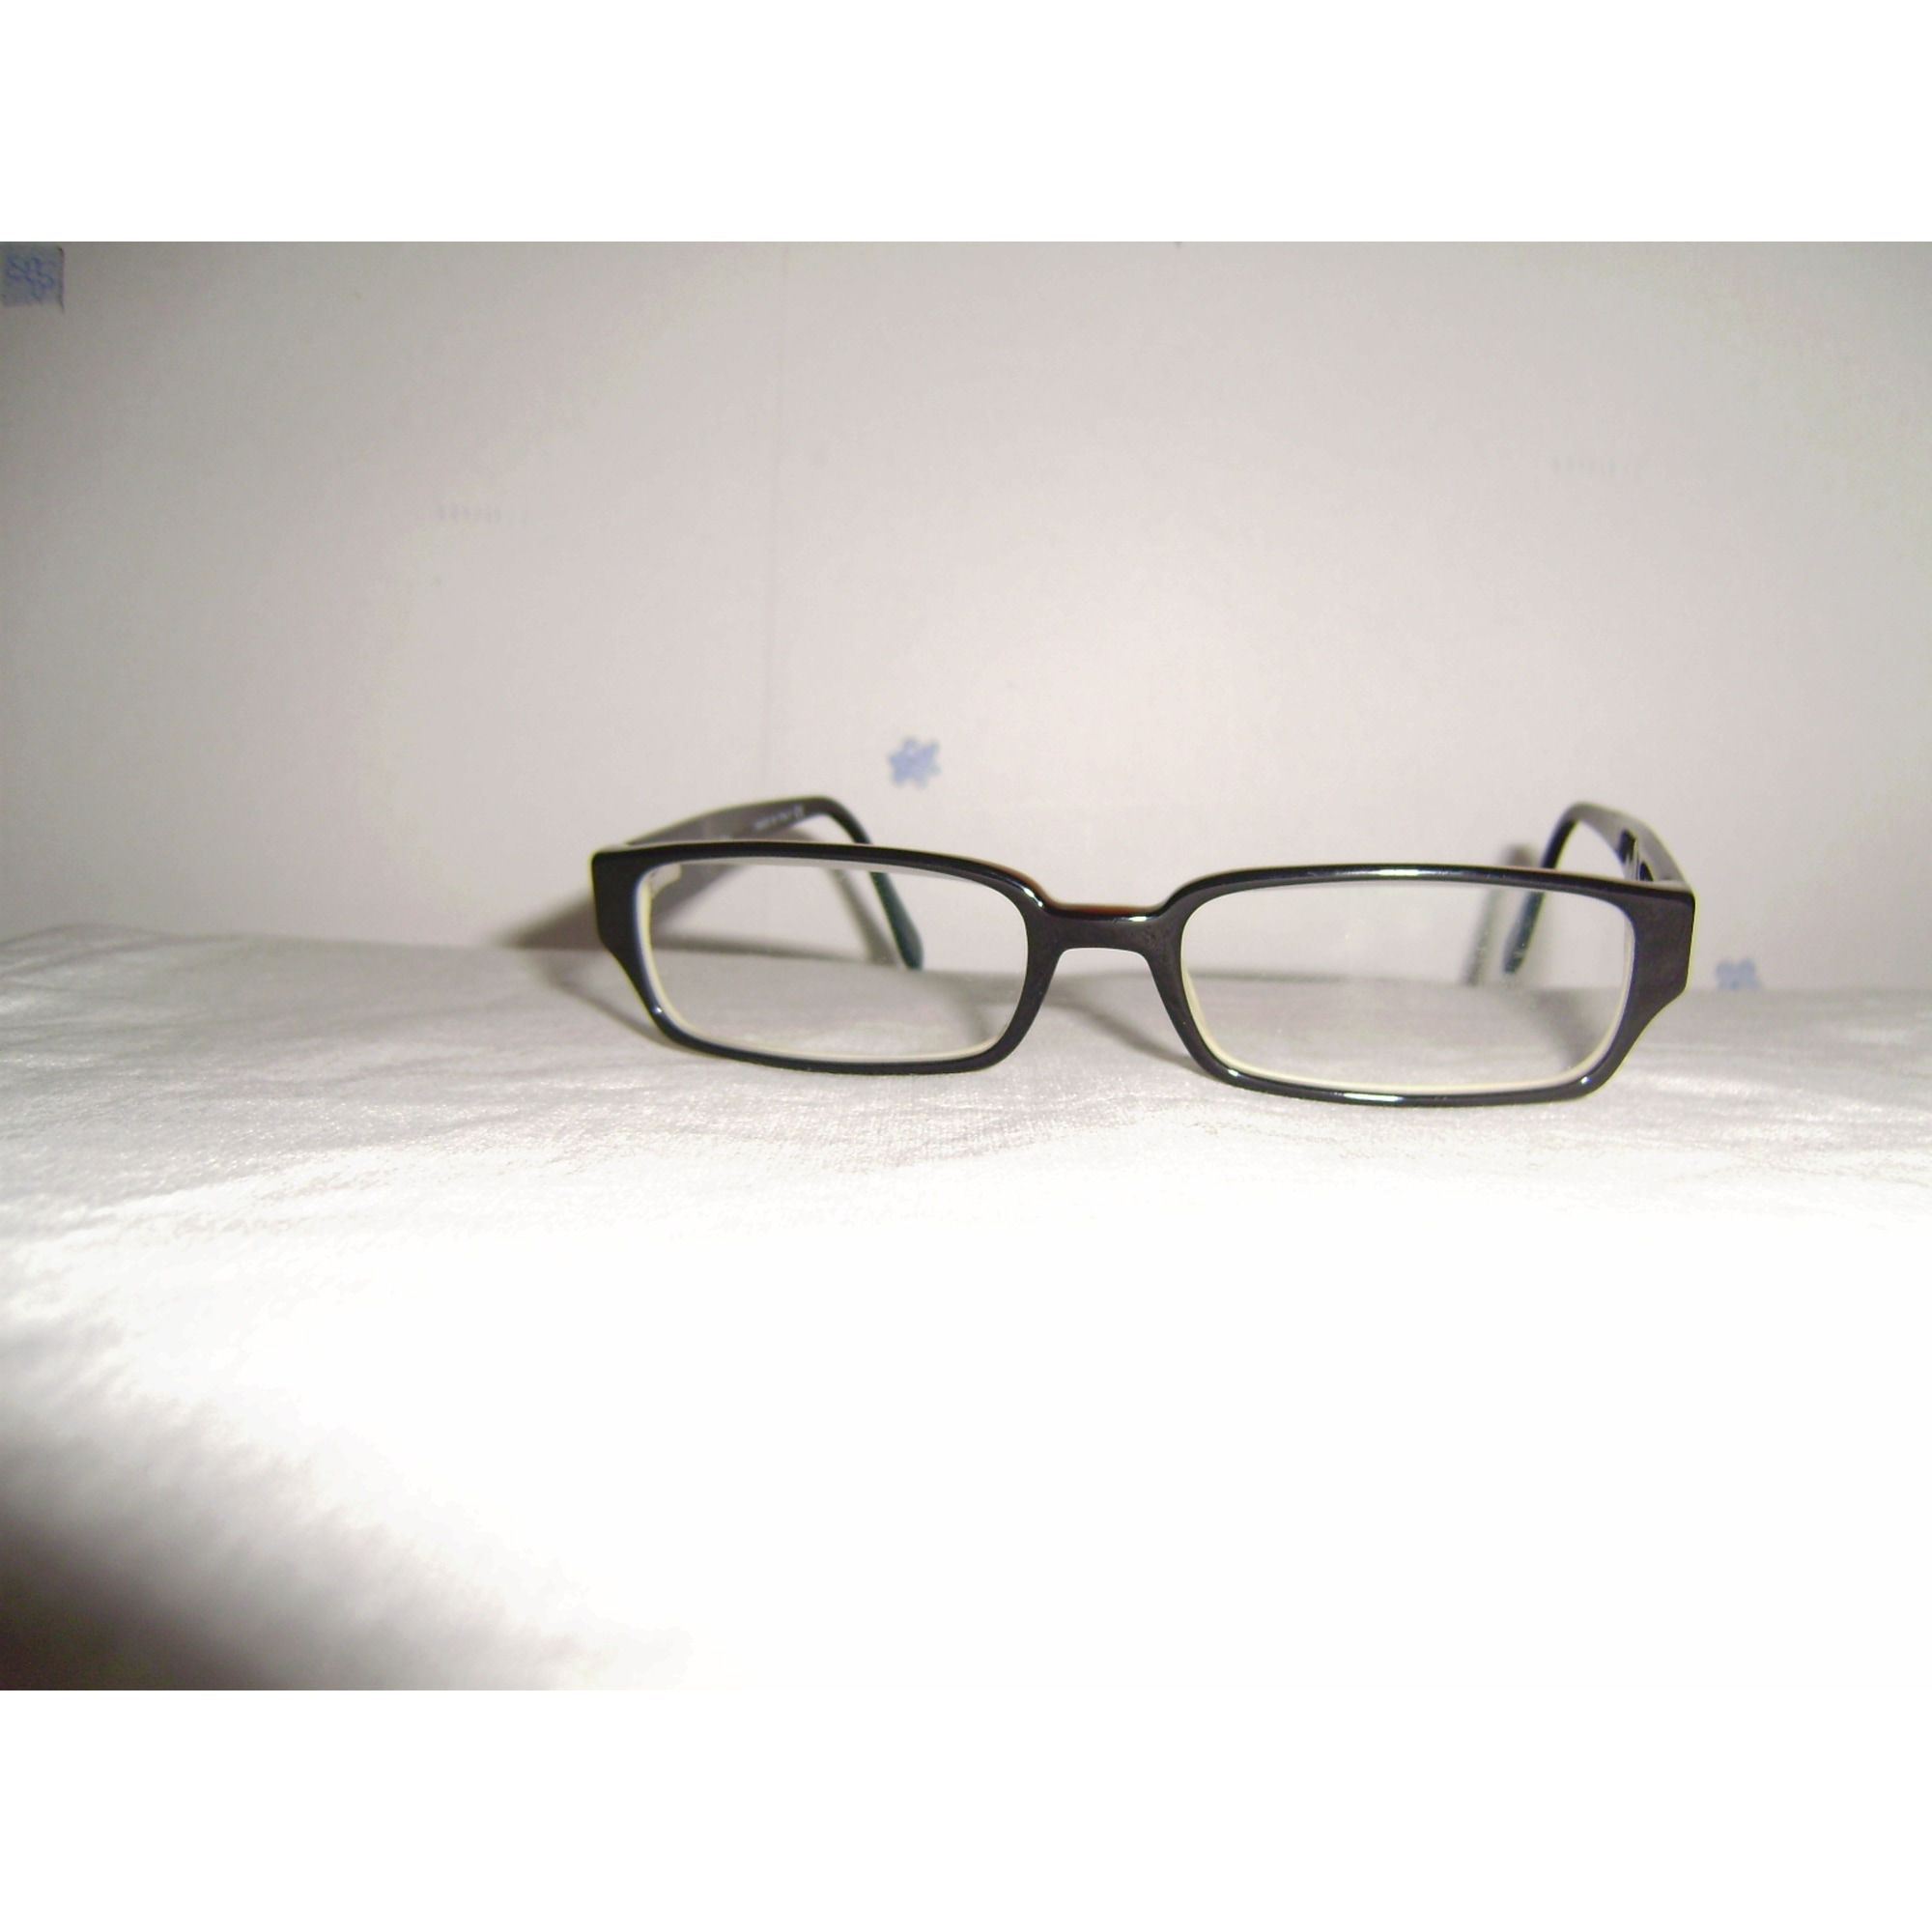 eyeglass frames chanel black 2049960